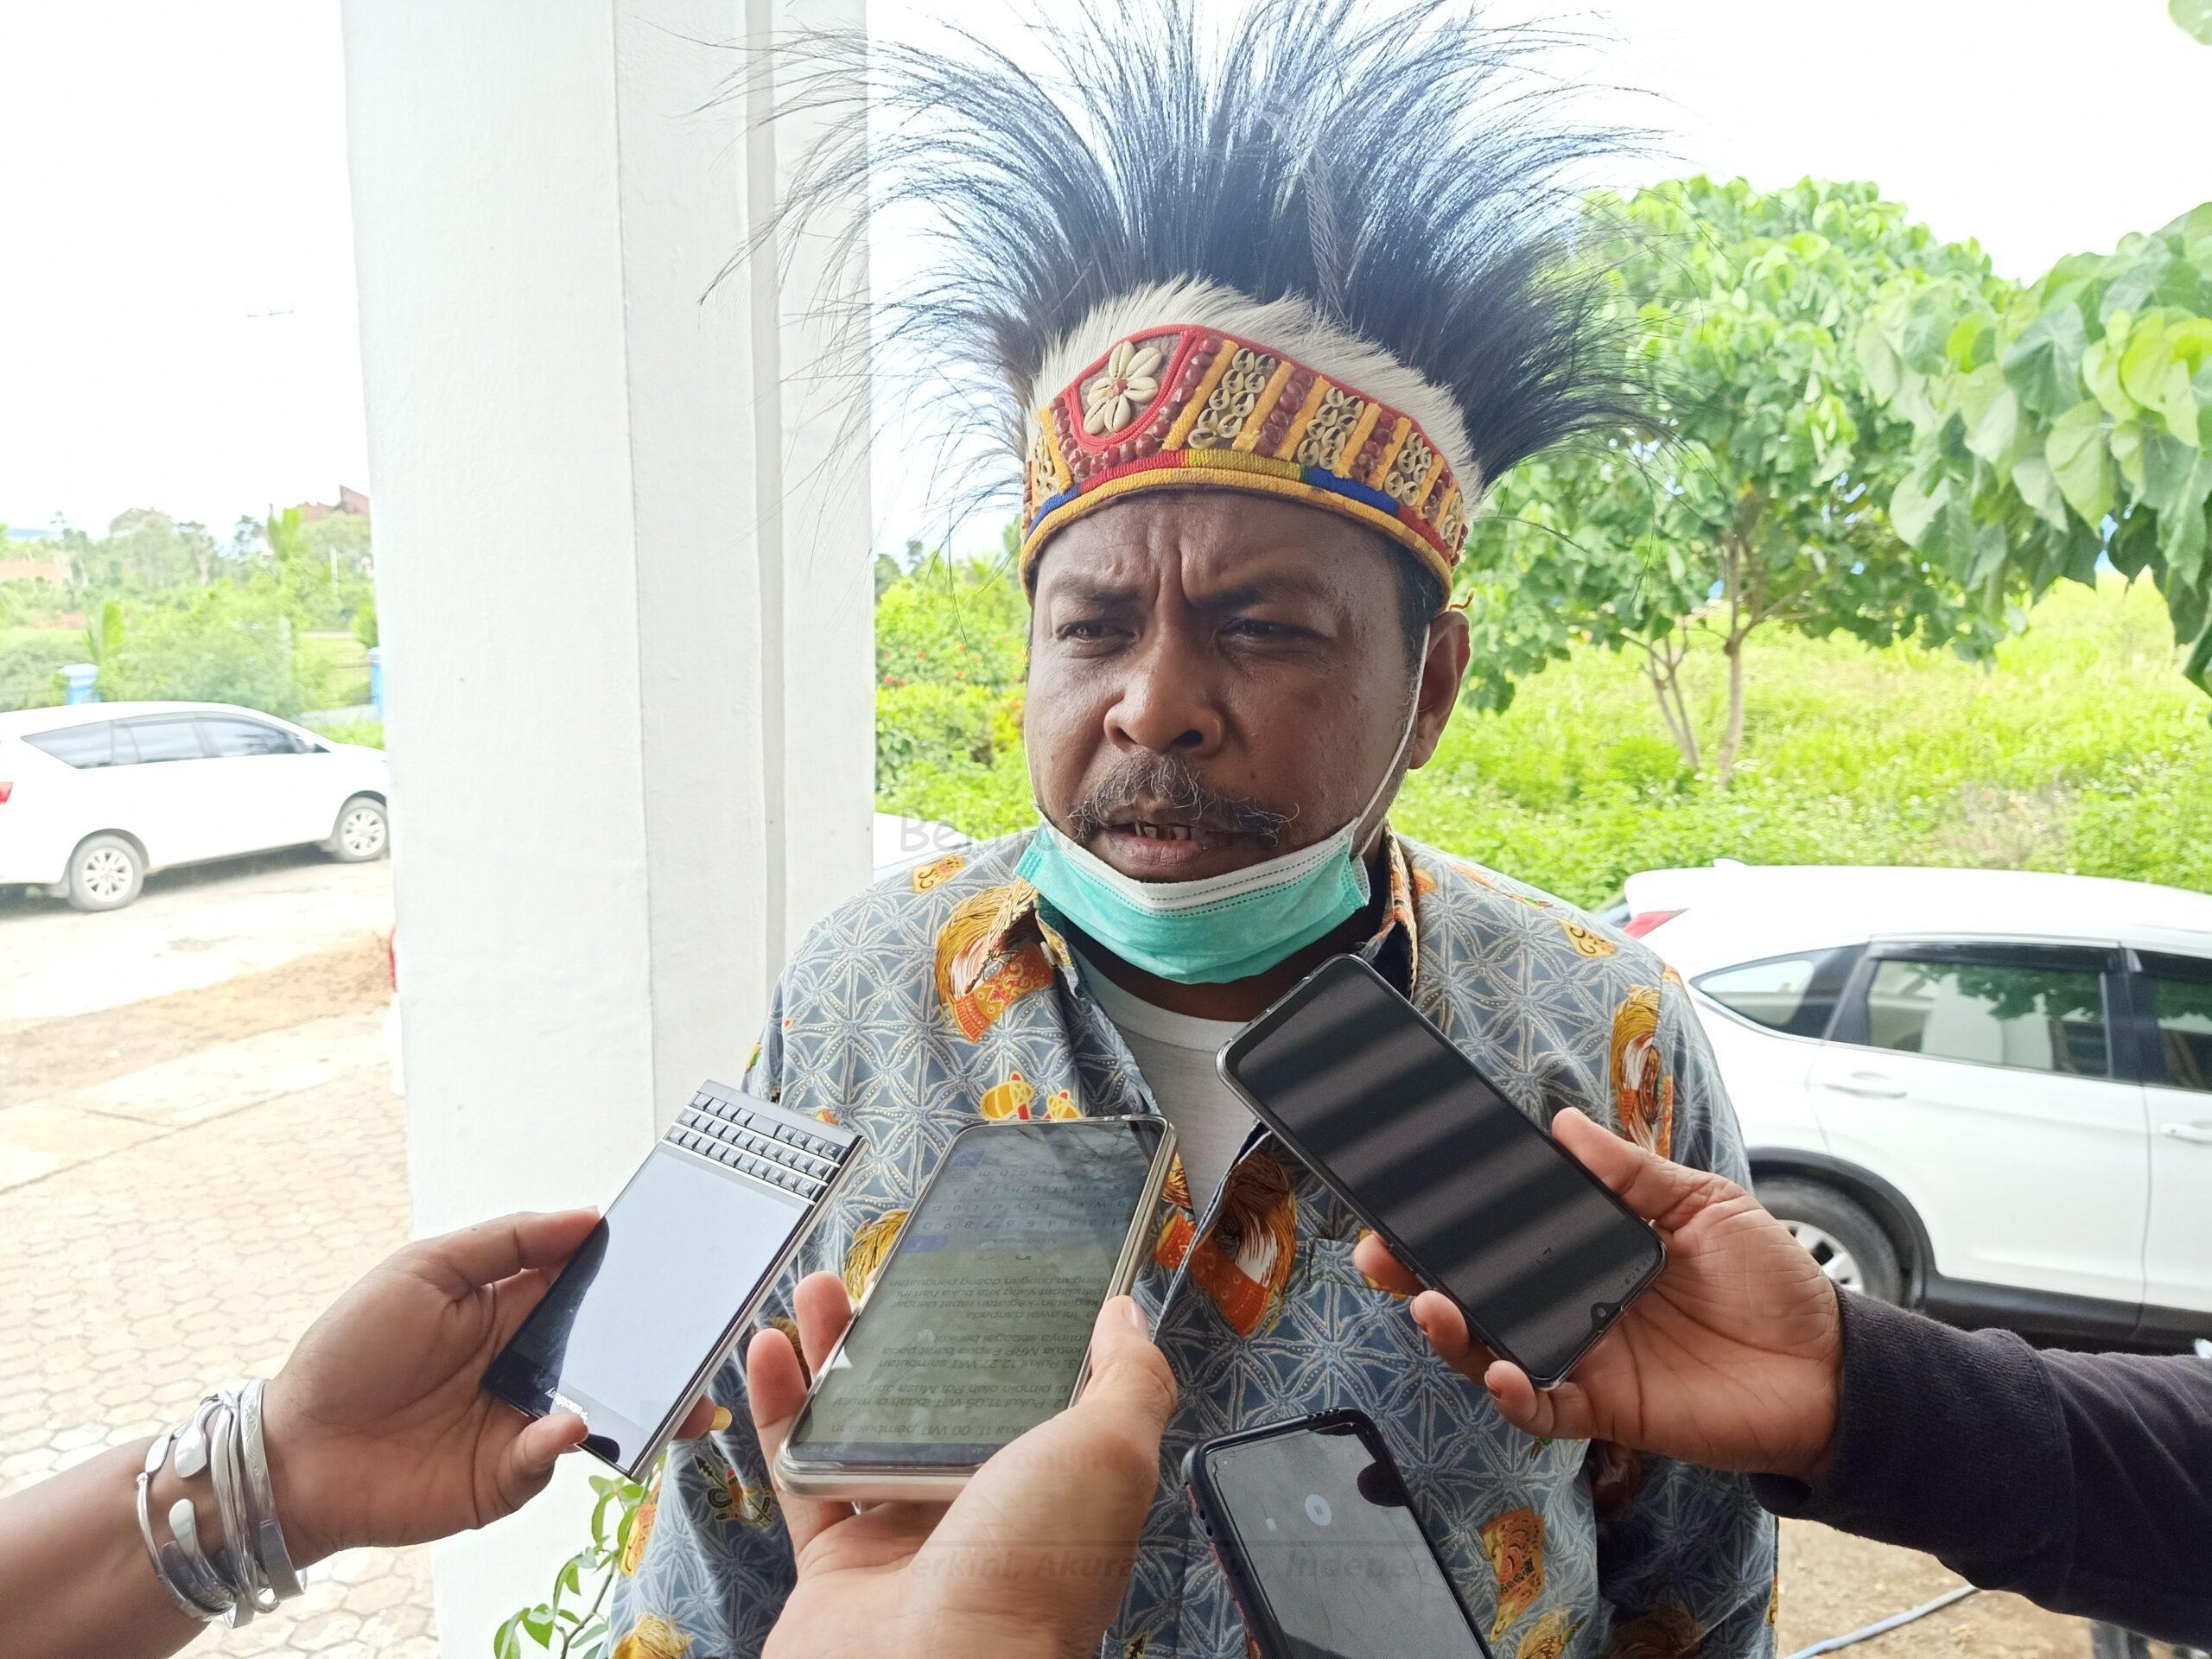 Ketua MRP PB: Data Pemohon Rekomendasi Bintara Otsus Membludak 19 IMG20200924124836 scaled